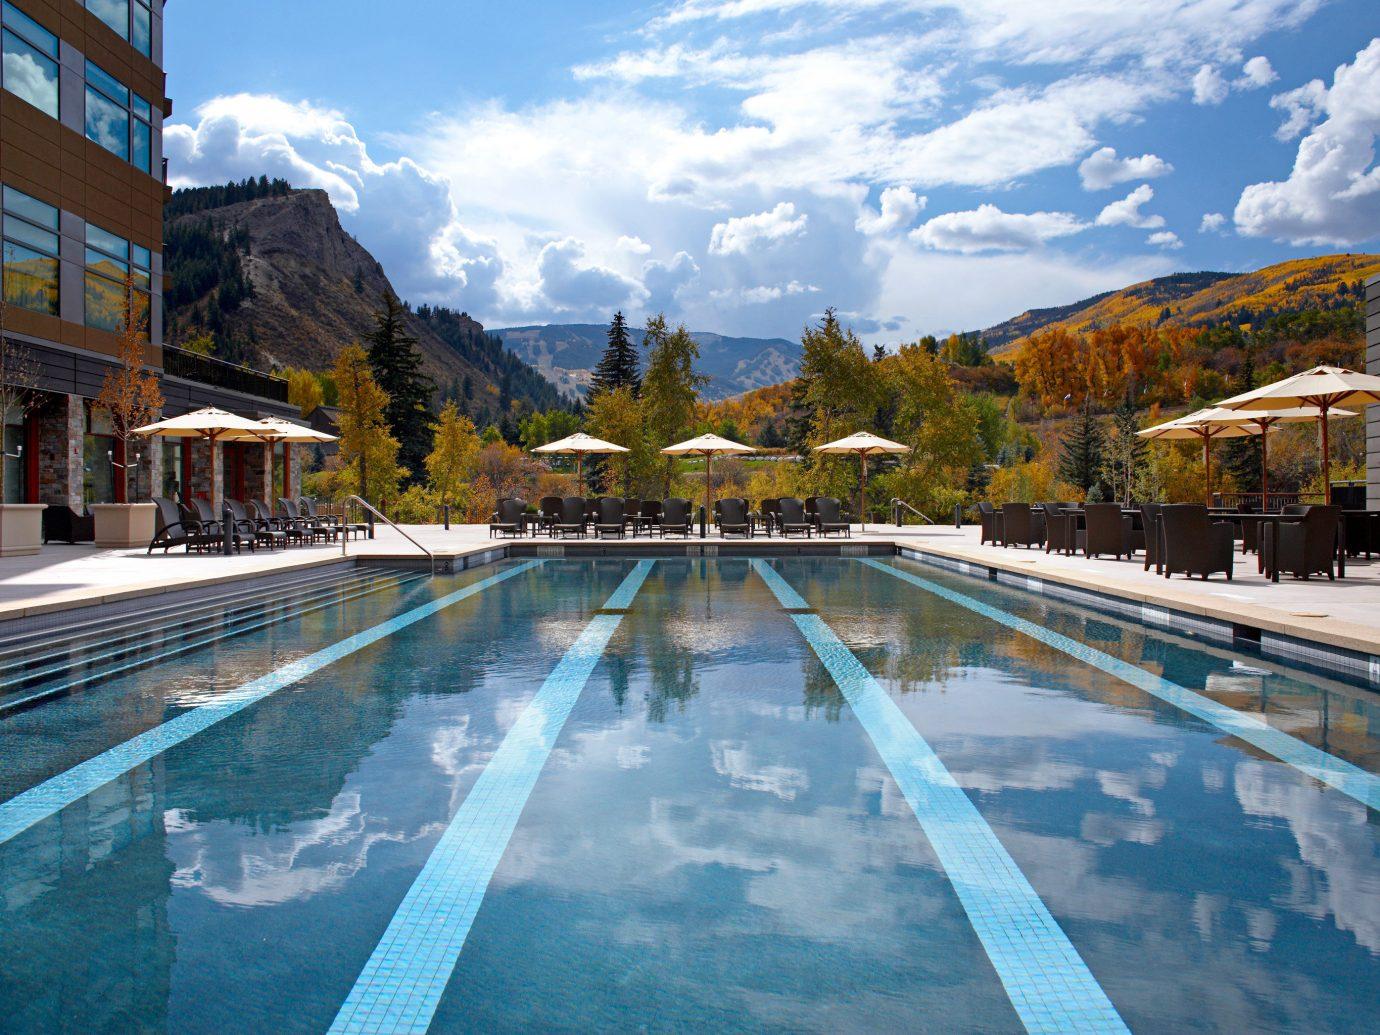 The Westin Riverfront Resort & Spa